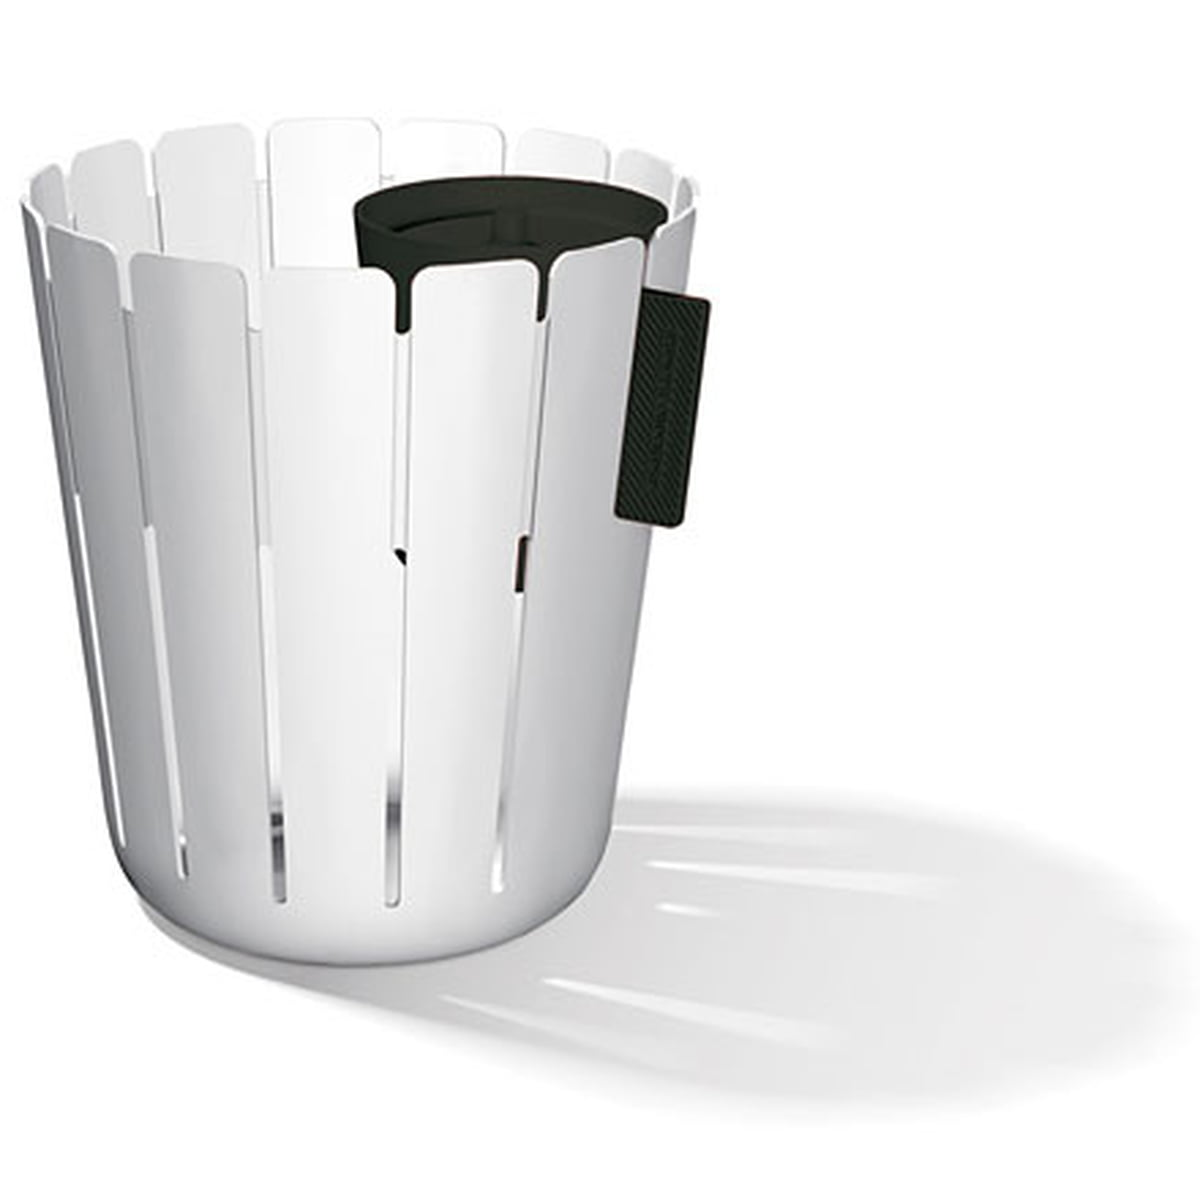 Konstantin Slawinski - SL17 Basketbin Mülleimer-System, weiß / schwarz (2 Tlg.)